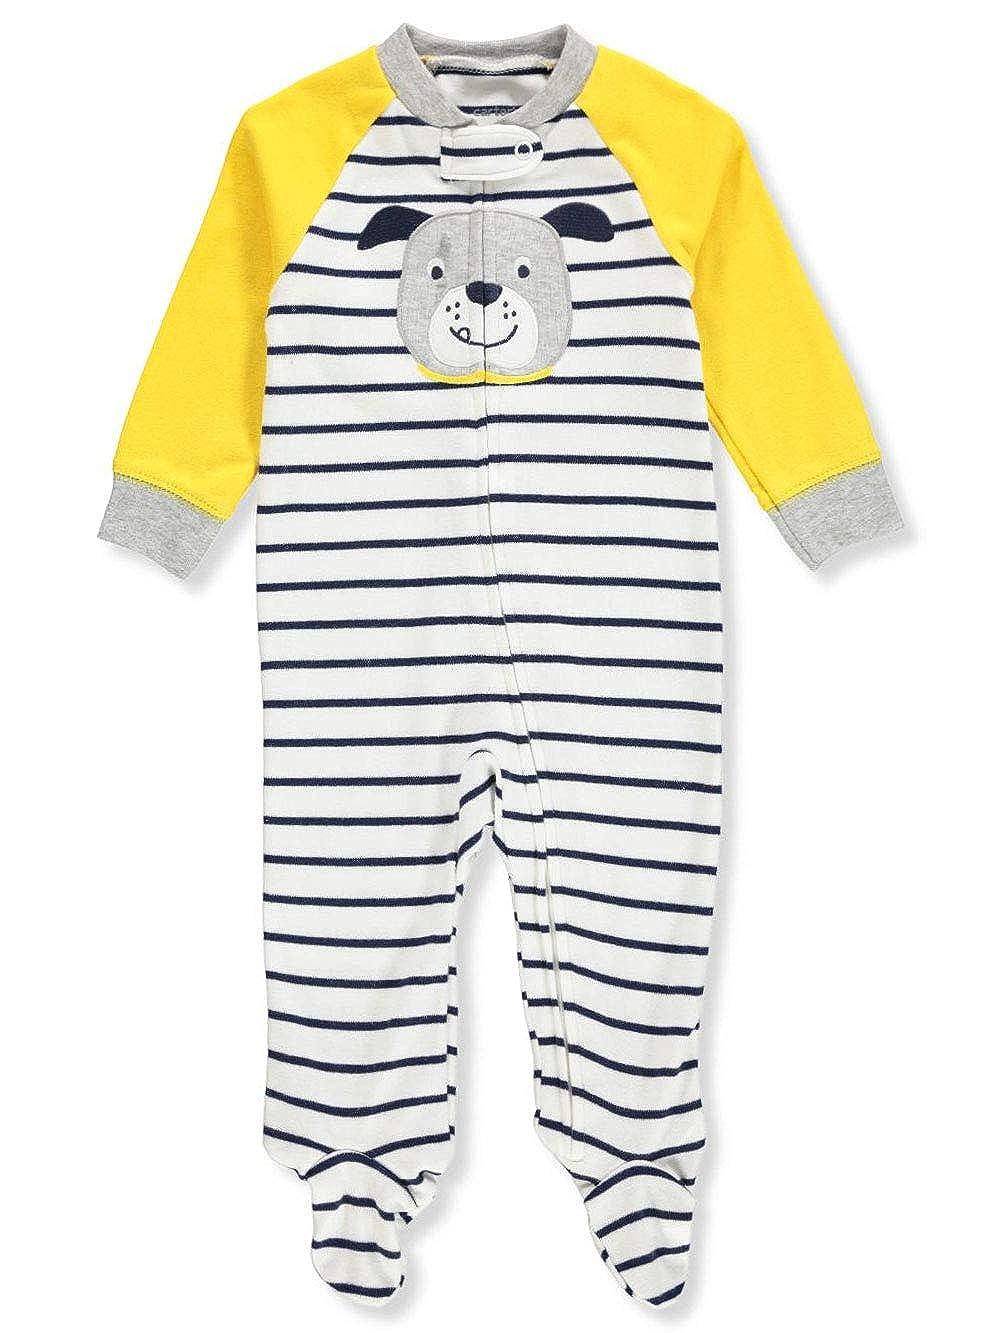 Carters Baby Boys Dinosaur Zip-Up Cotton Sleep /& Play